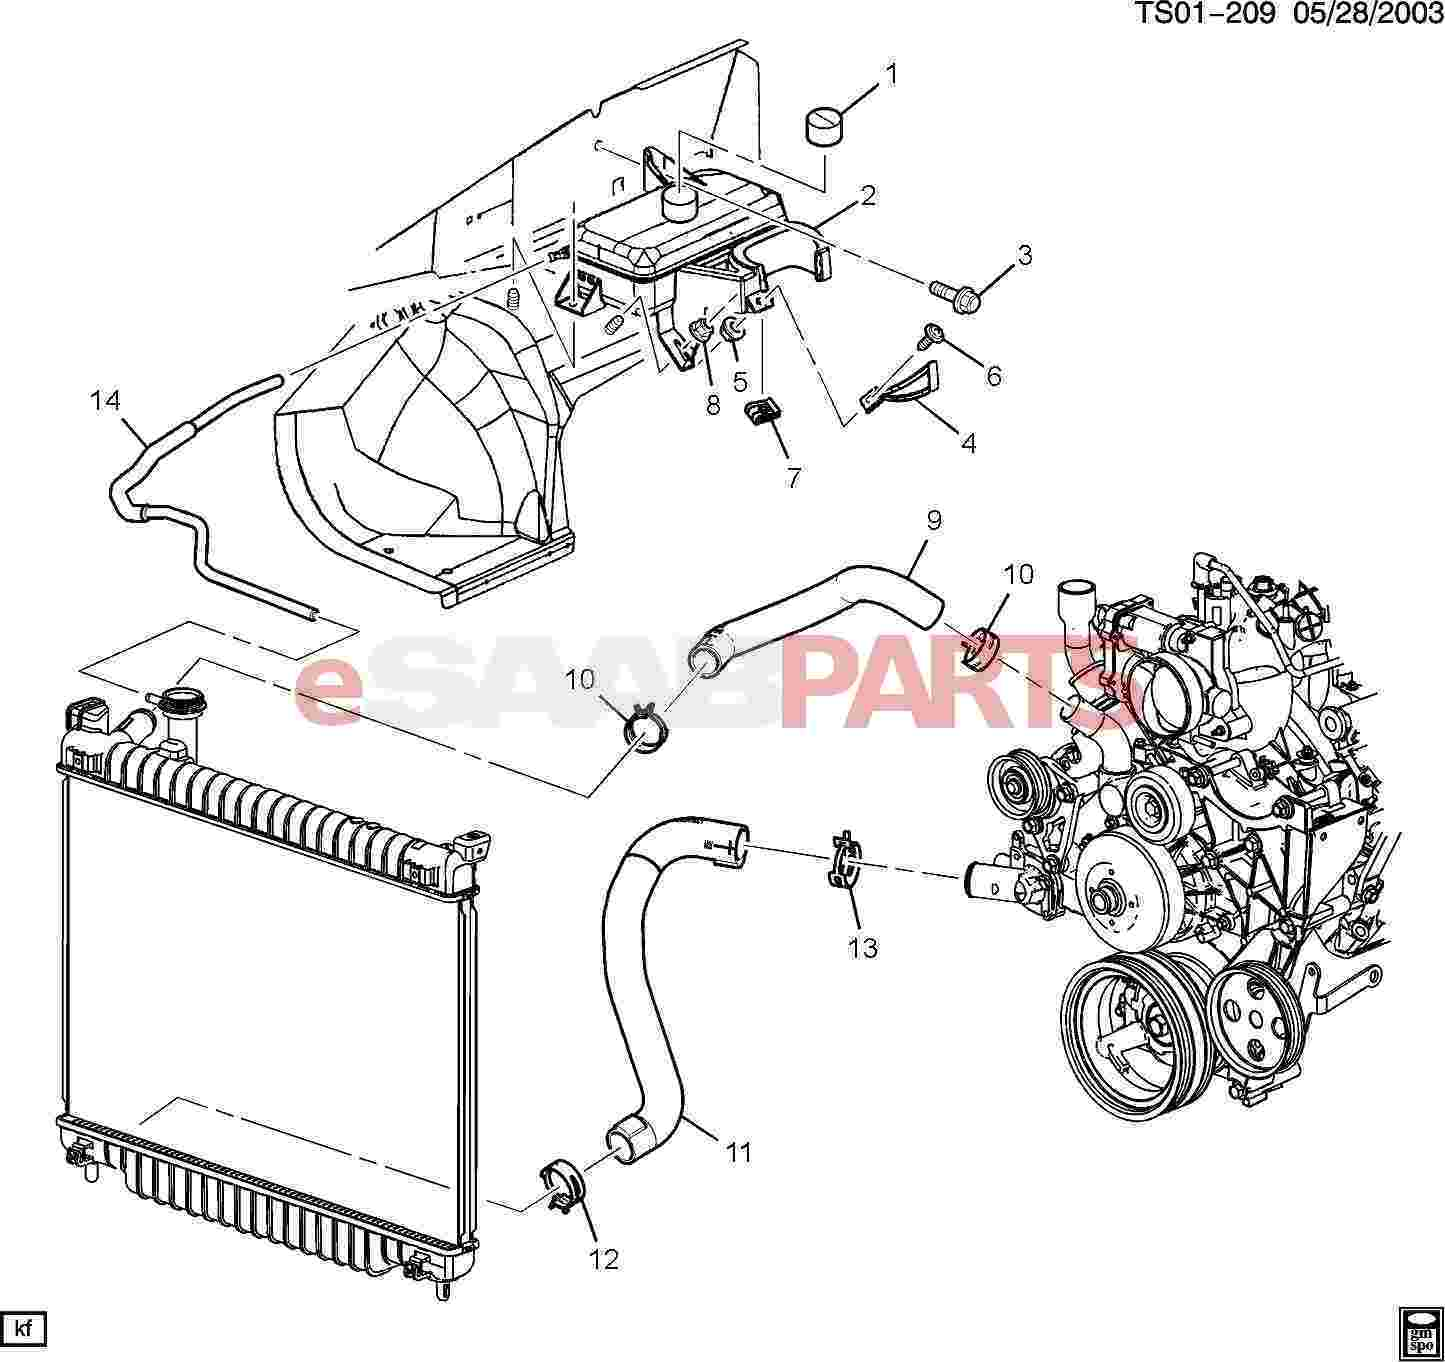 25793412] SAAB Hose, Cool Rcvy Rsvr - Genuine Saab Parts from ...